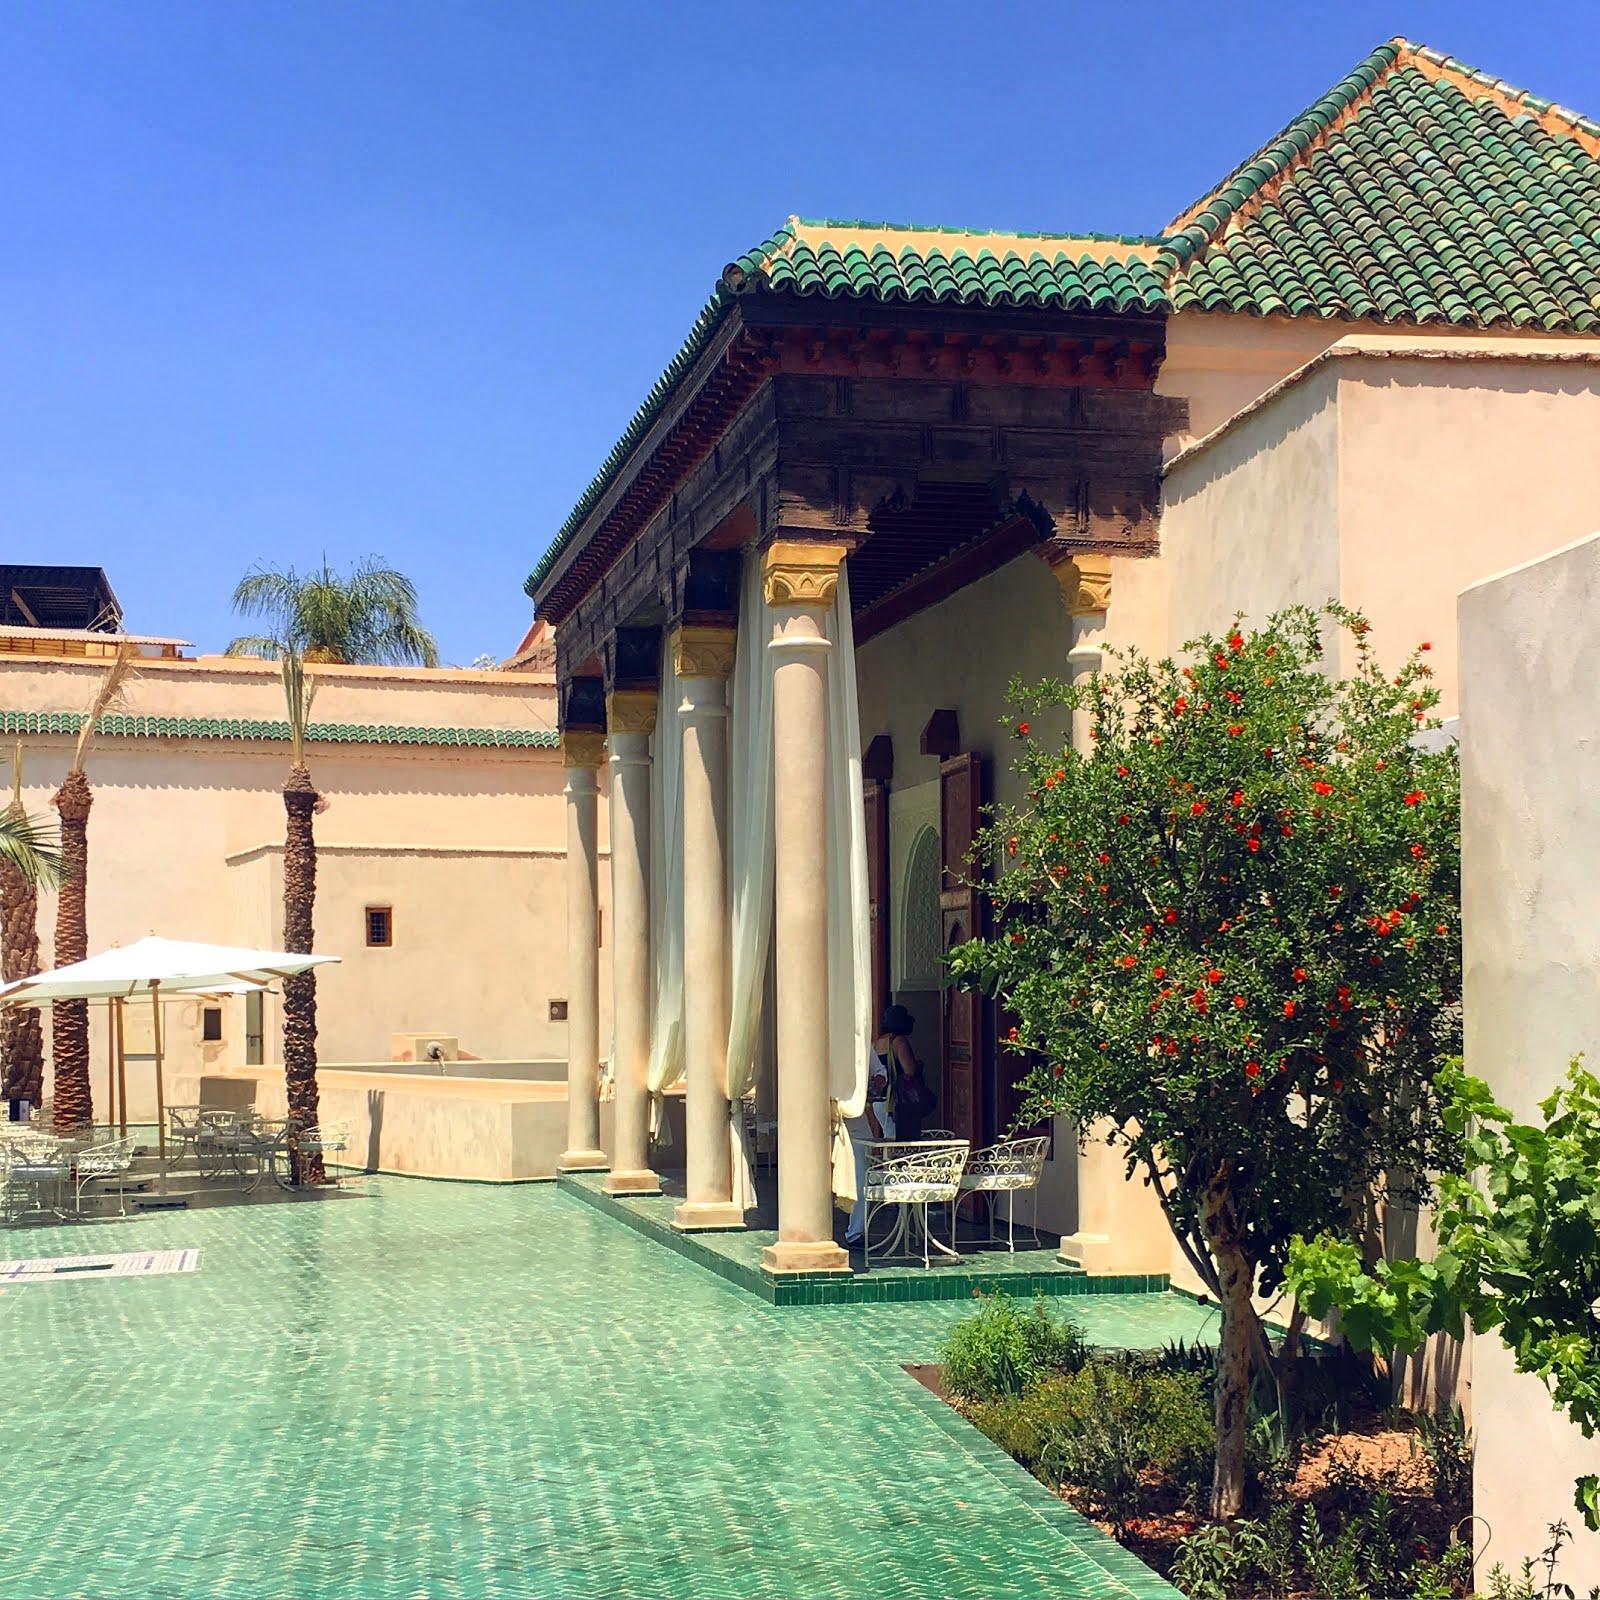 Marrakech shopping tour for hot days for Le jardin marrakech